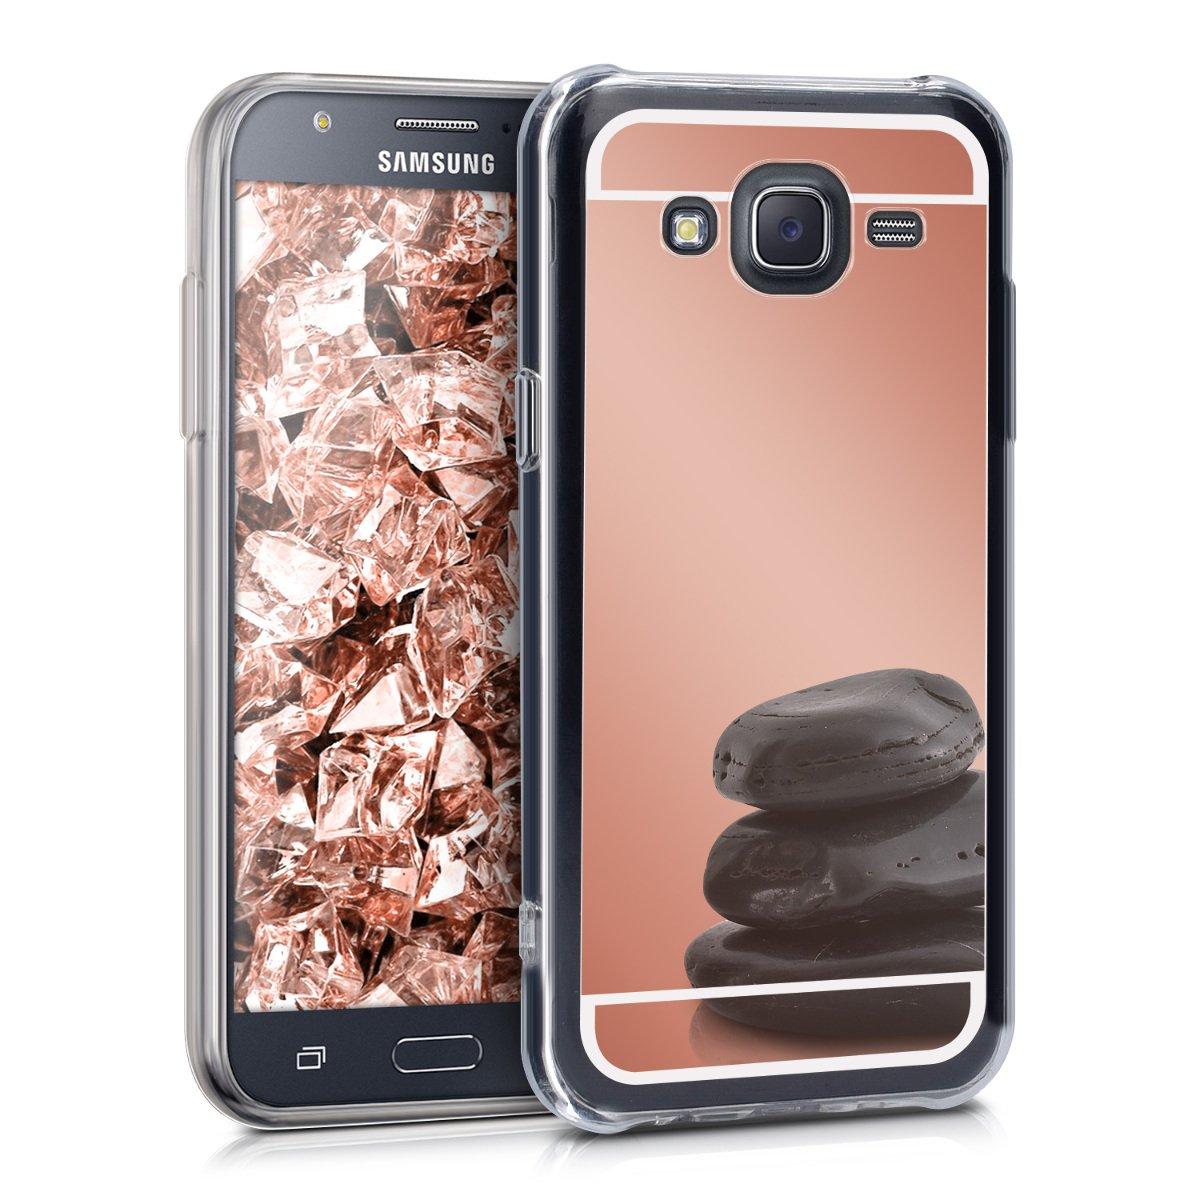 cover samsung galaxy j5 2015 silicone